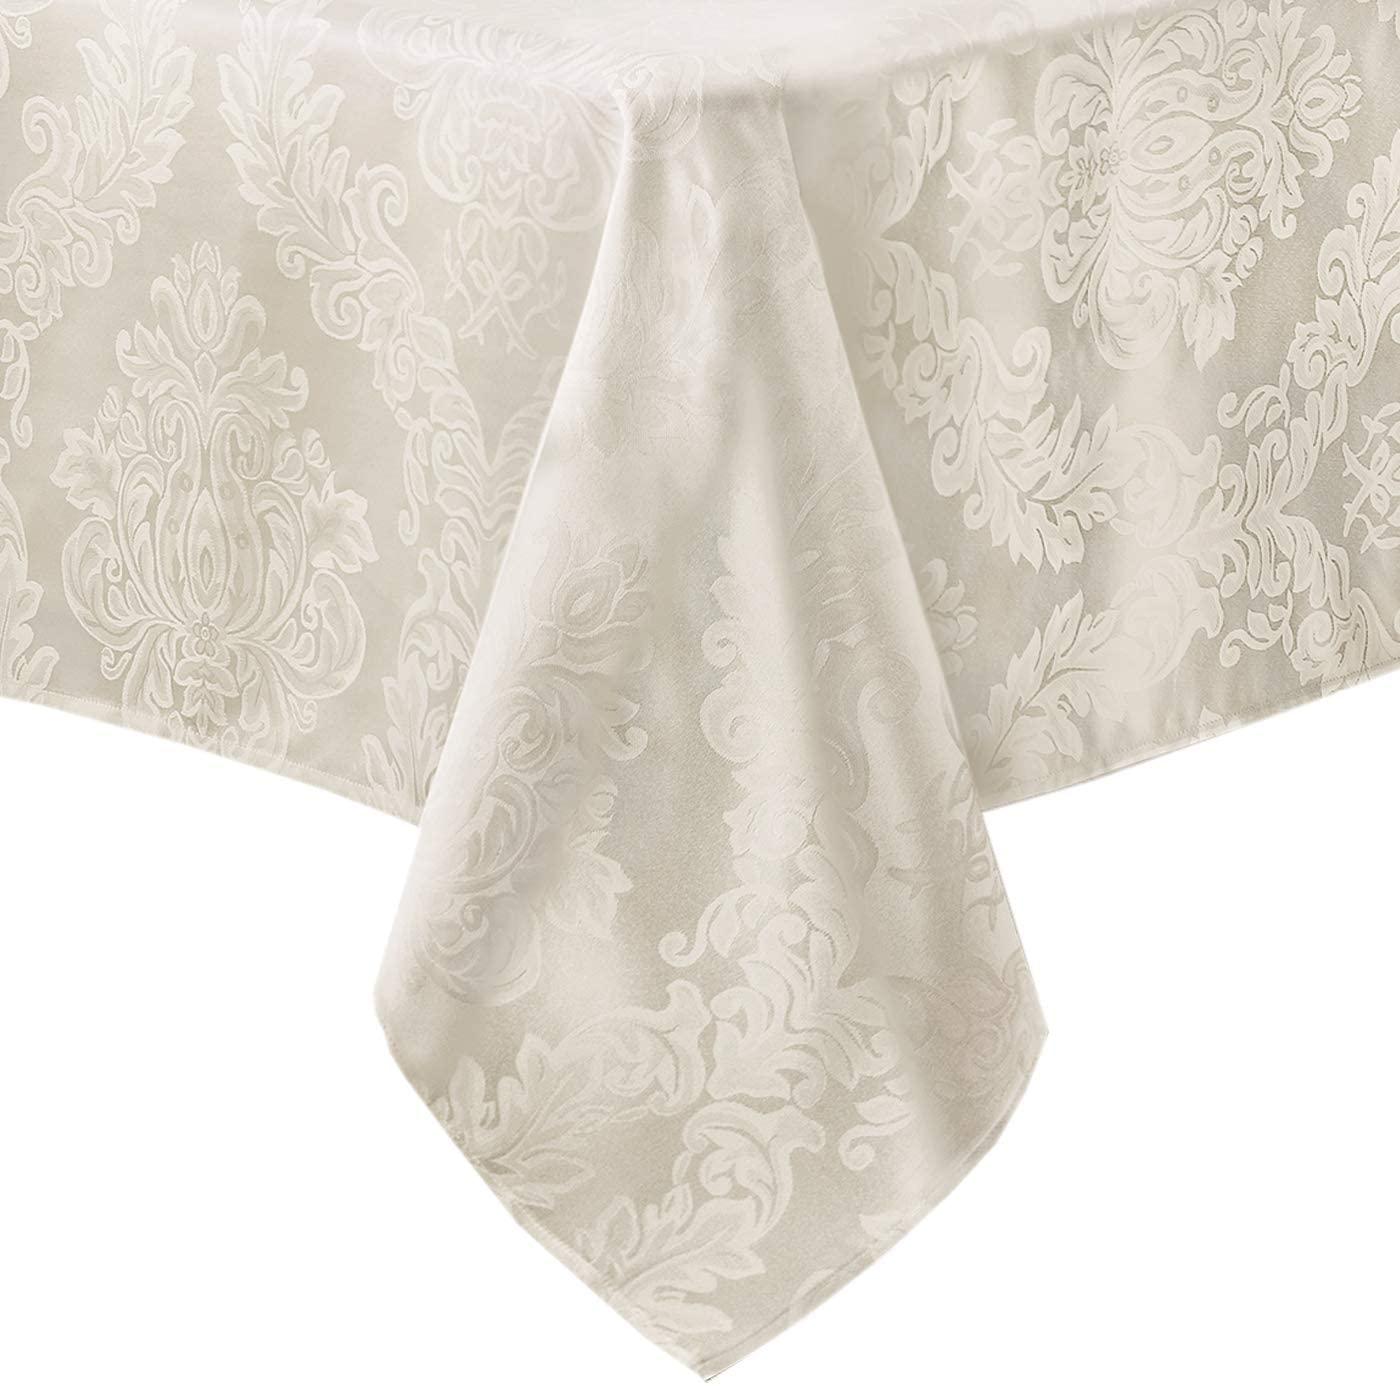 Newbridge Barcelona No-Iron Soil Resistant Fabric Damask Tablecloth - 52 X 70 Oblong - Antique White